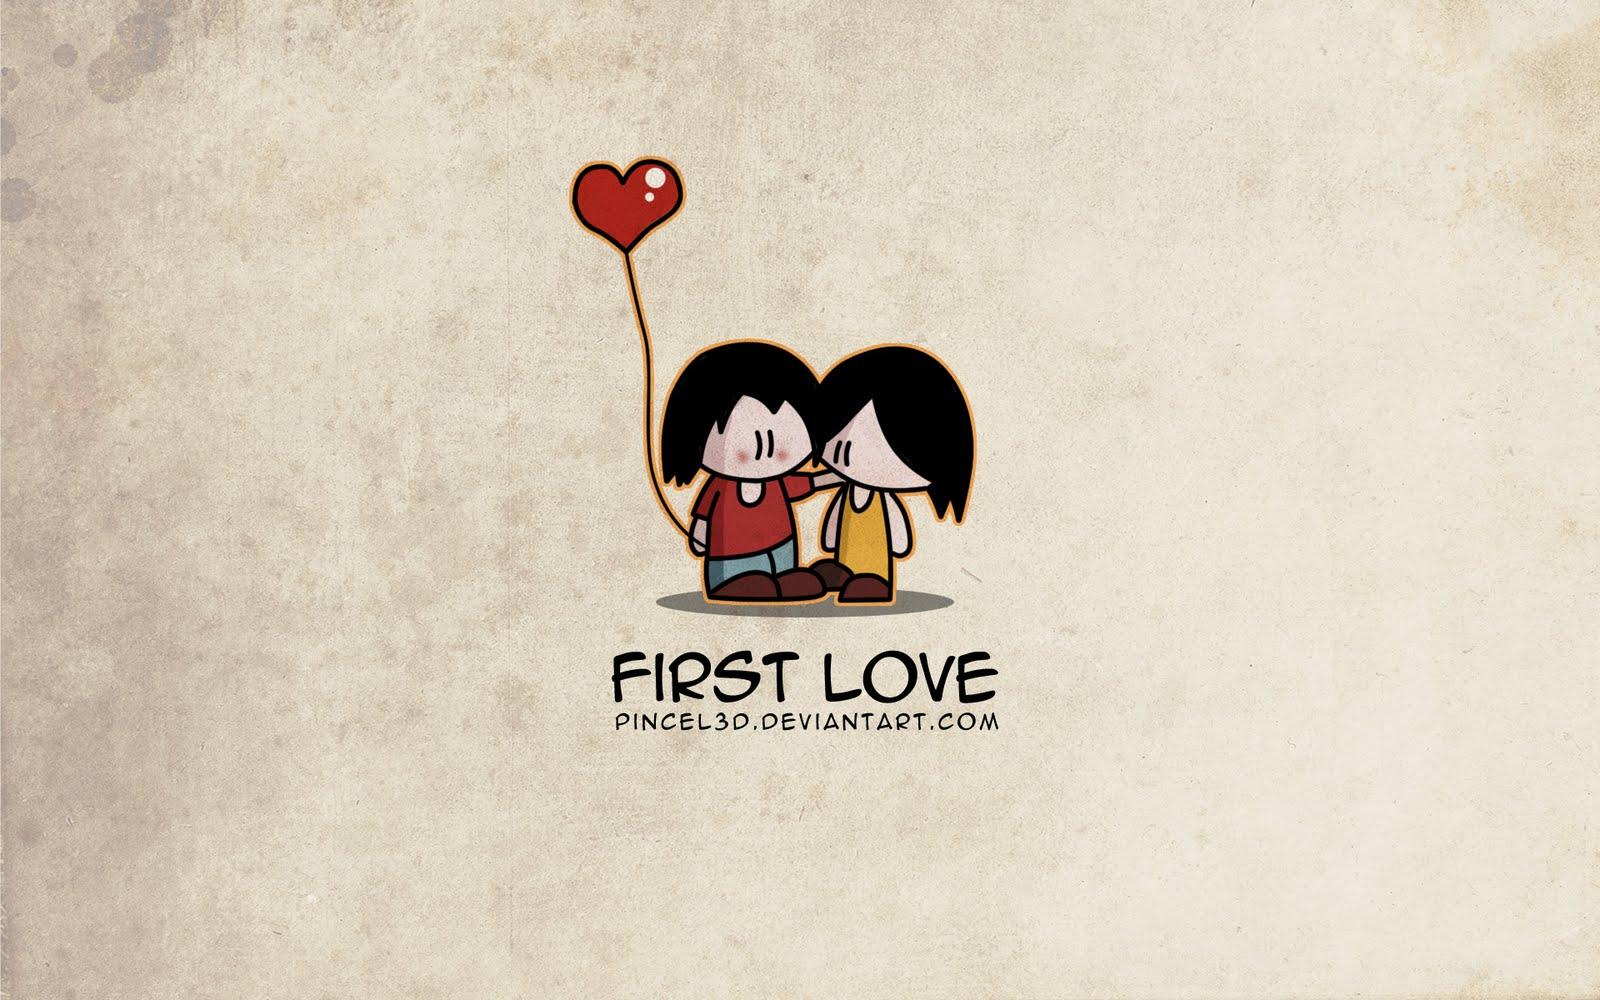 http://2.bp.blogspot.com/-likPJQj1eQA/TkEt35NeHLI/AAAAAAAAAHE/6wiwYYyO31s/s1600/ws_First_love_1920x1200.jpg